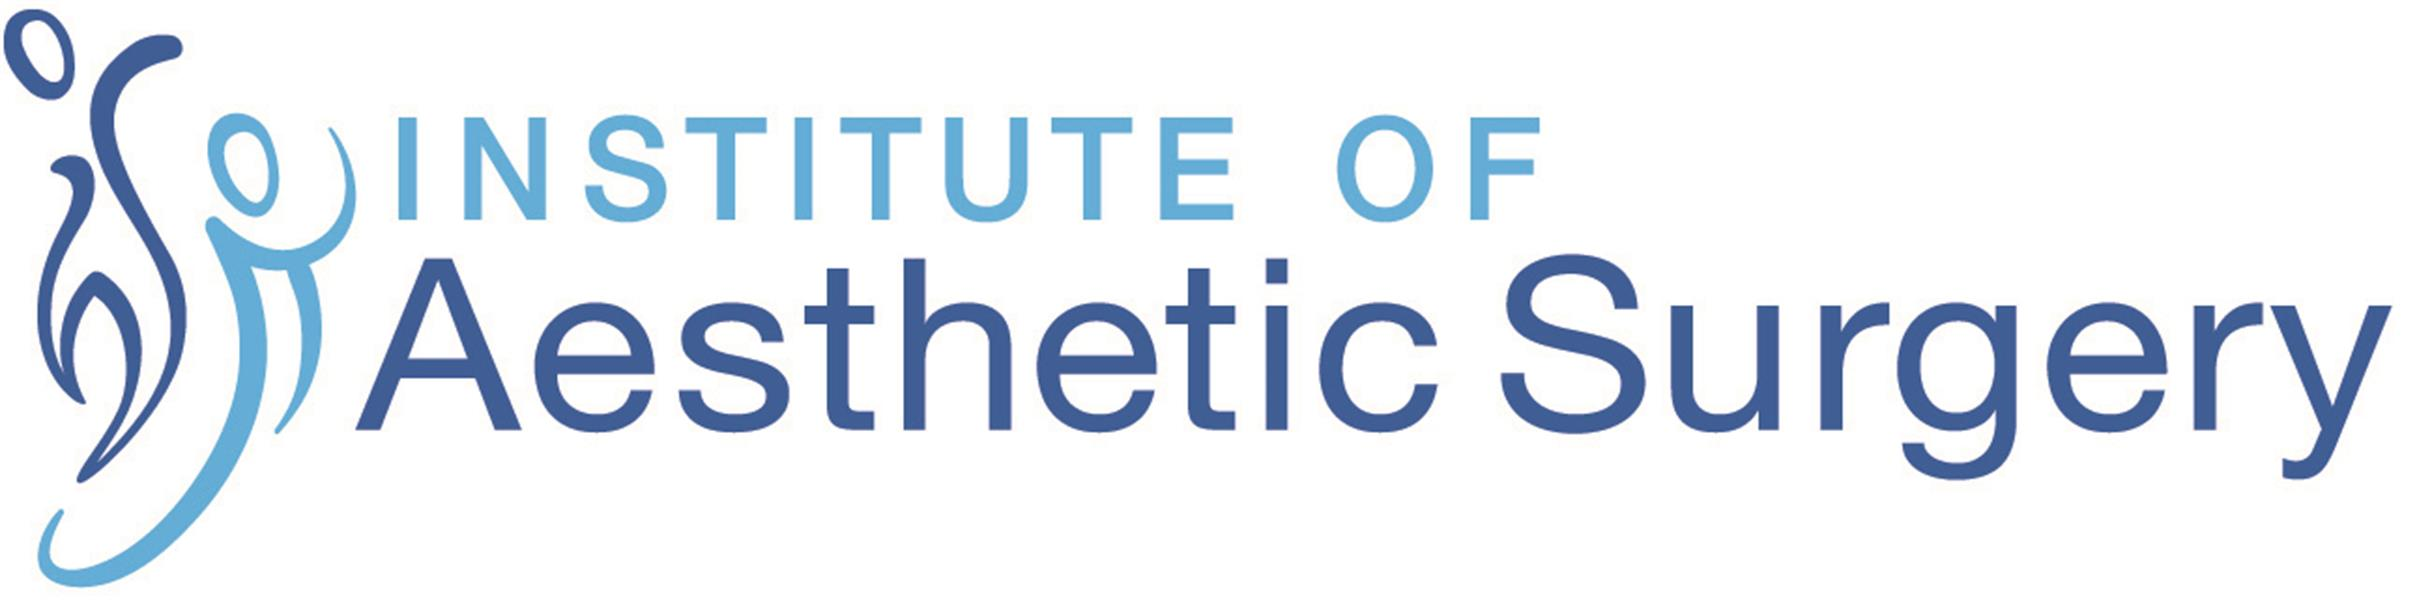 Institute of Aesthetic Surgery